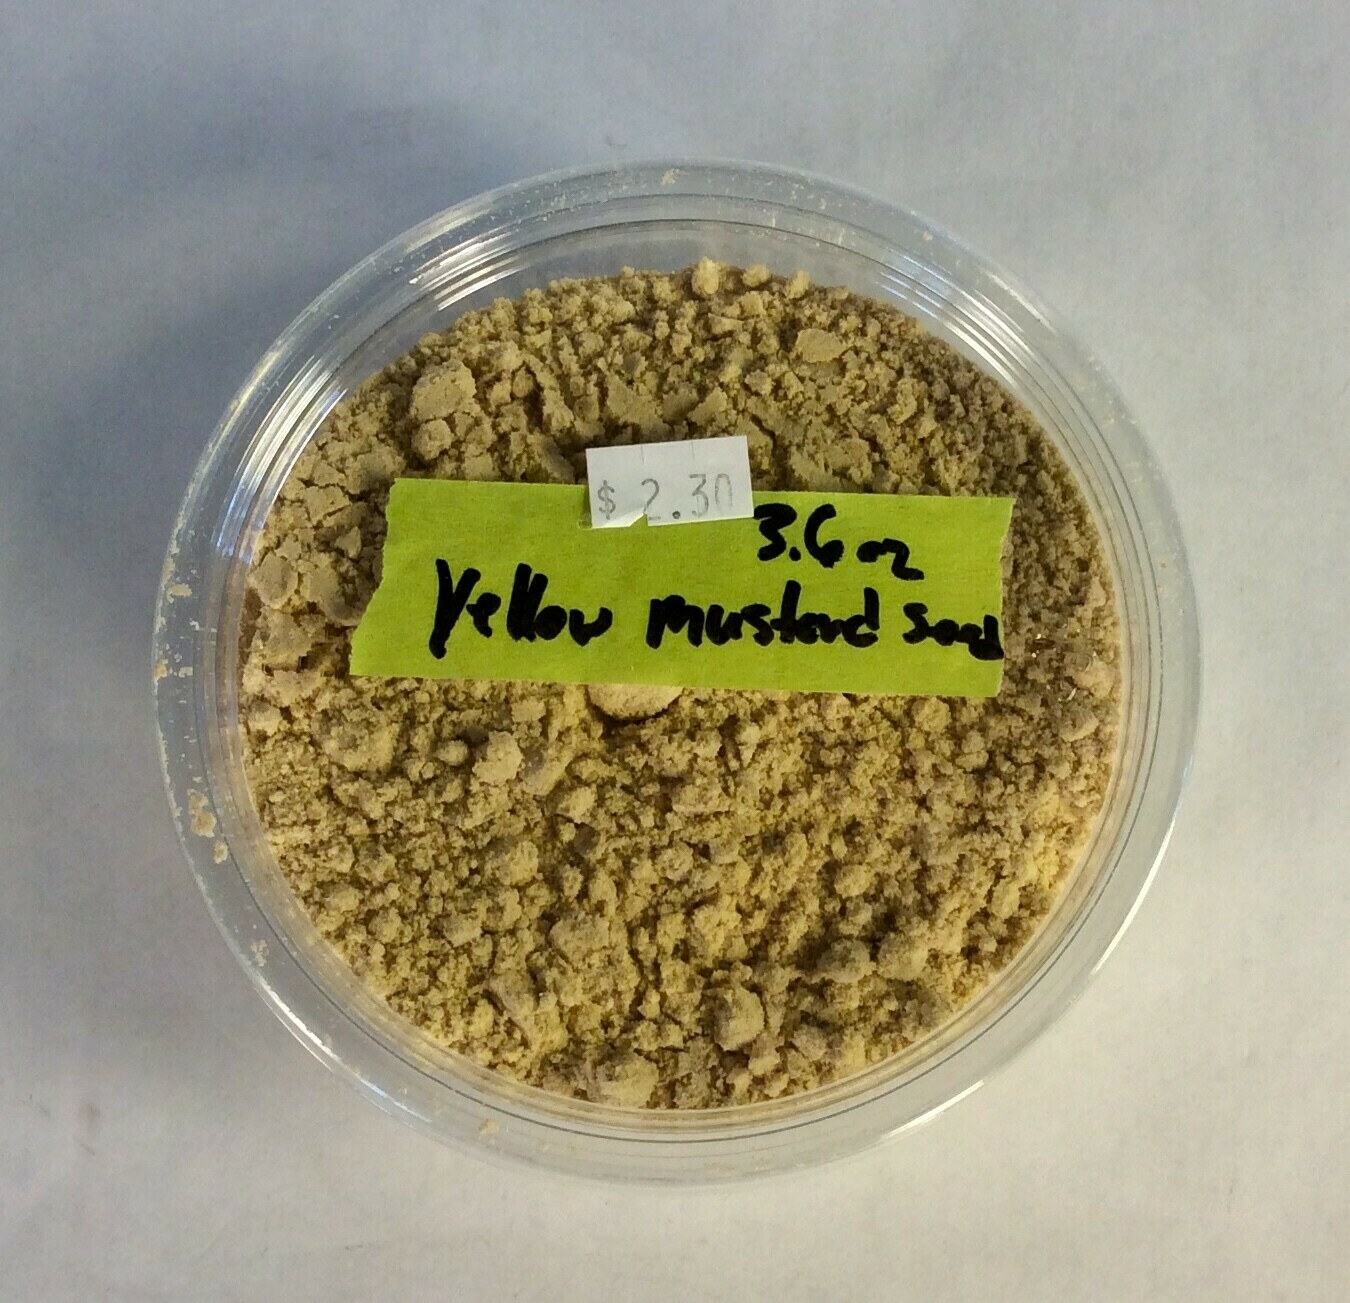 mustard, yellow; 3.6 oz; Frontier Organic; each